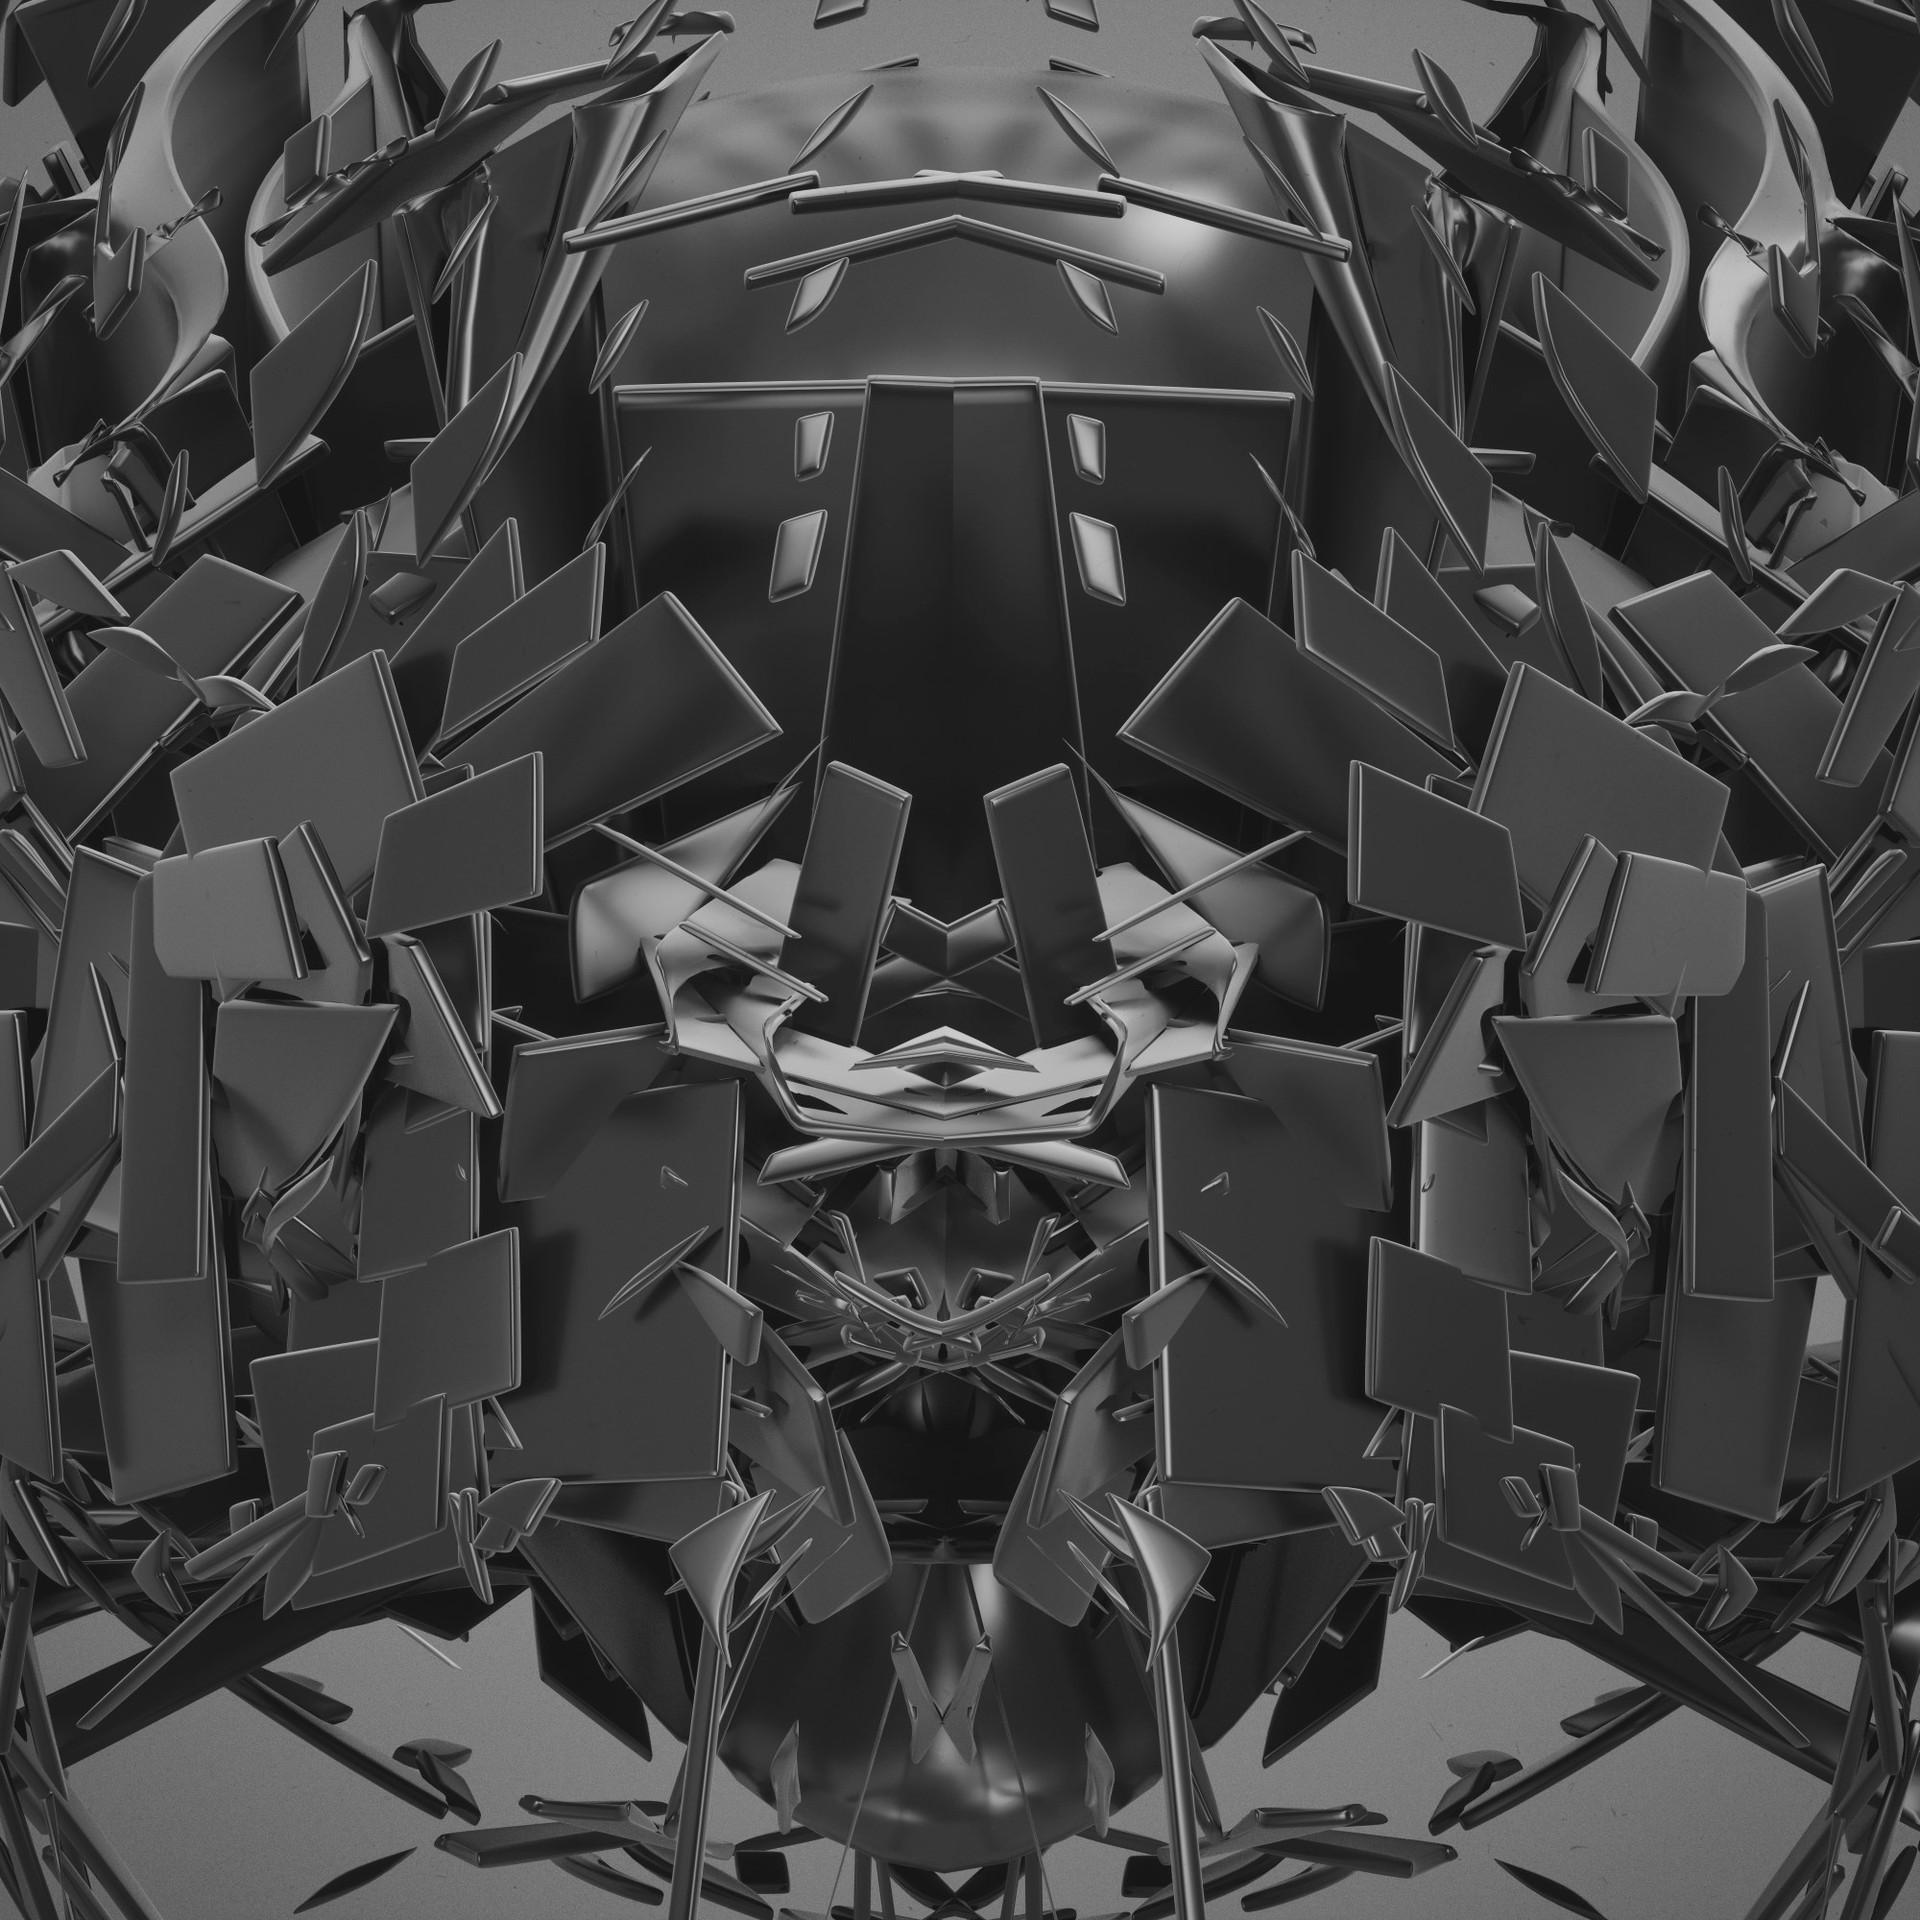 Kresimir jelusic robob3ar 379 261016 skl 26 custom